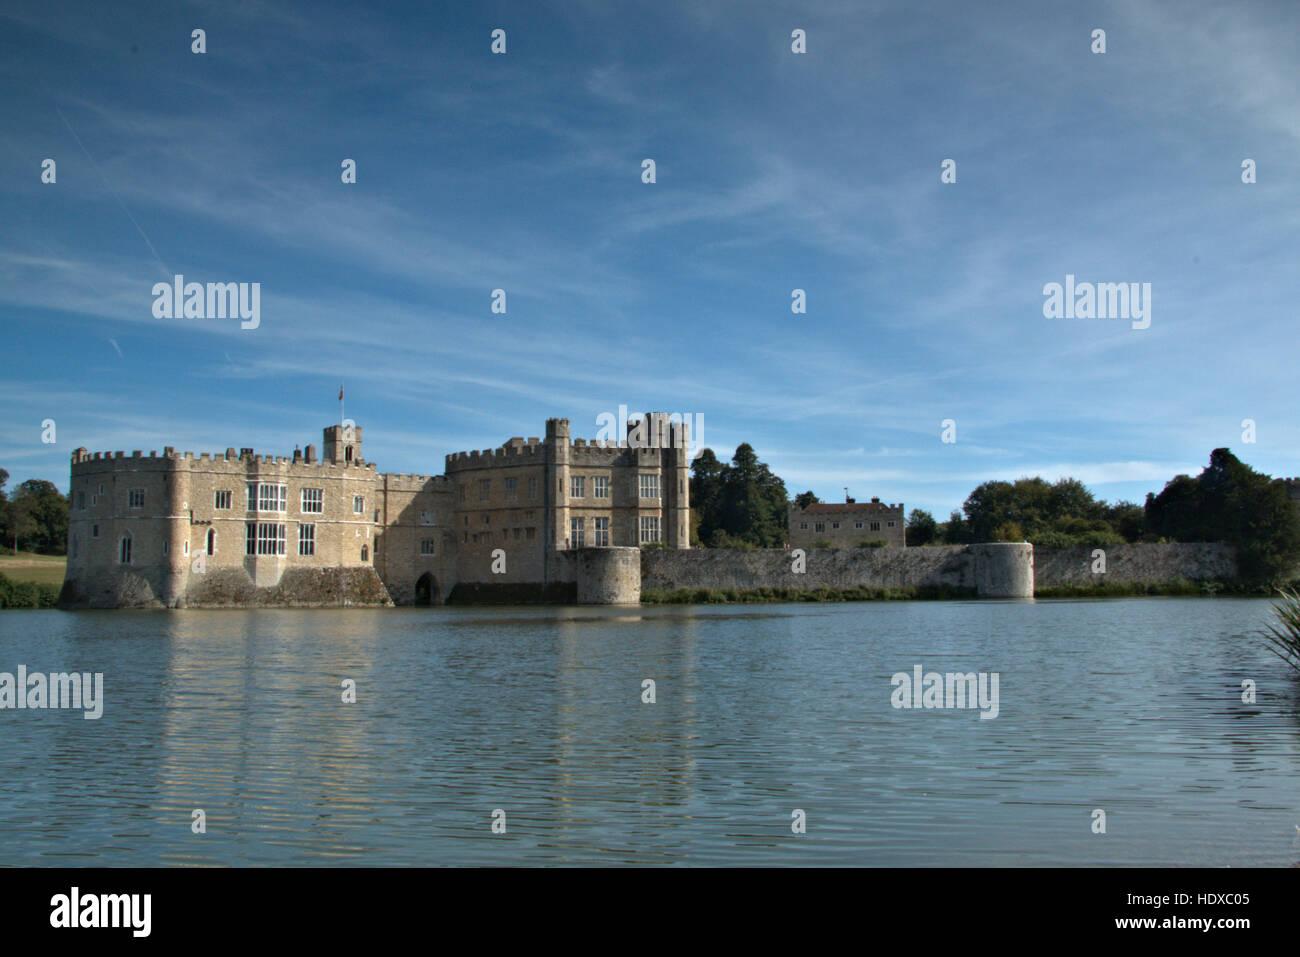 Leeds Castle using graduated filter - Stock Image